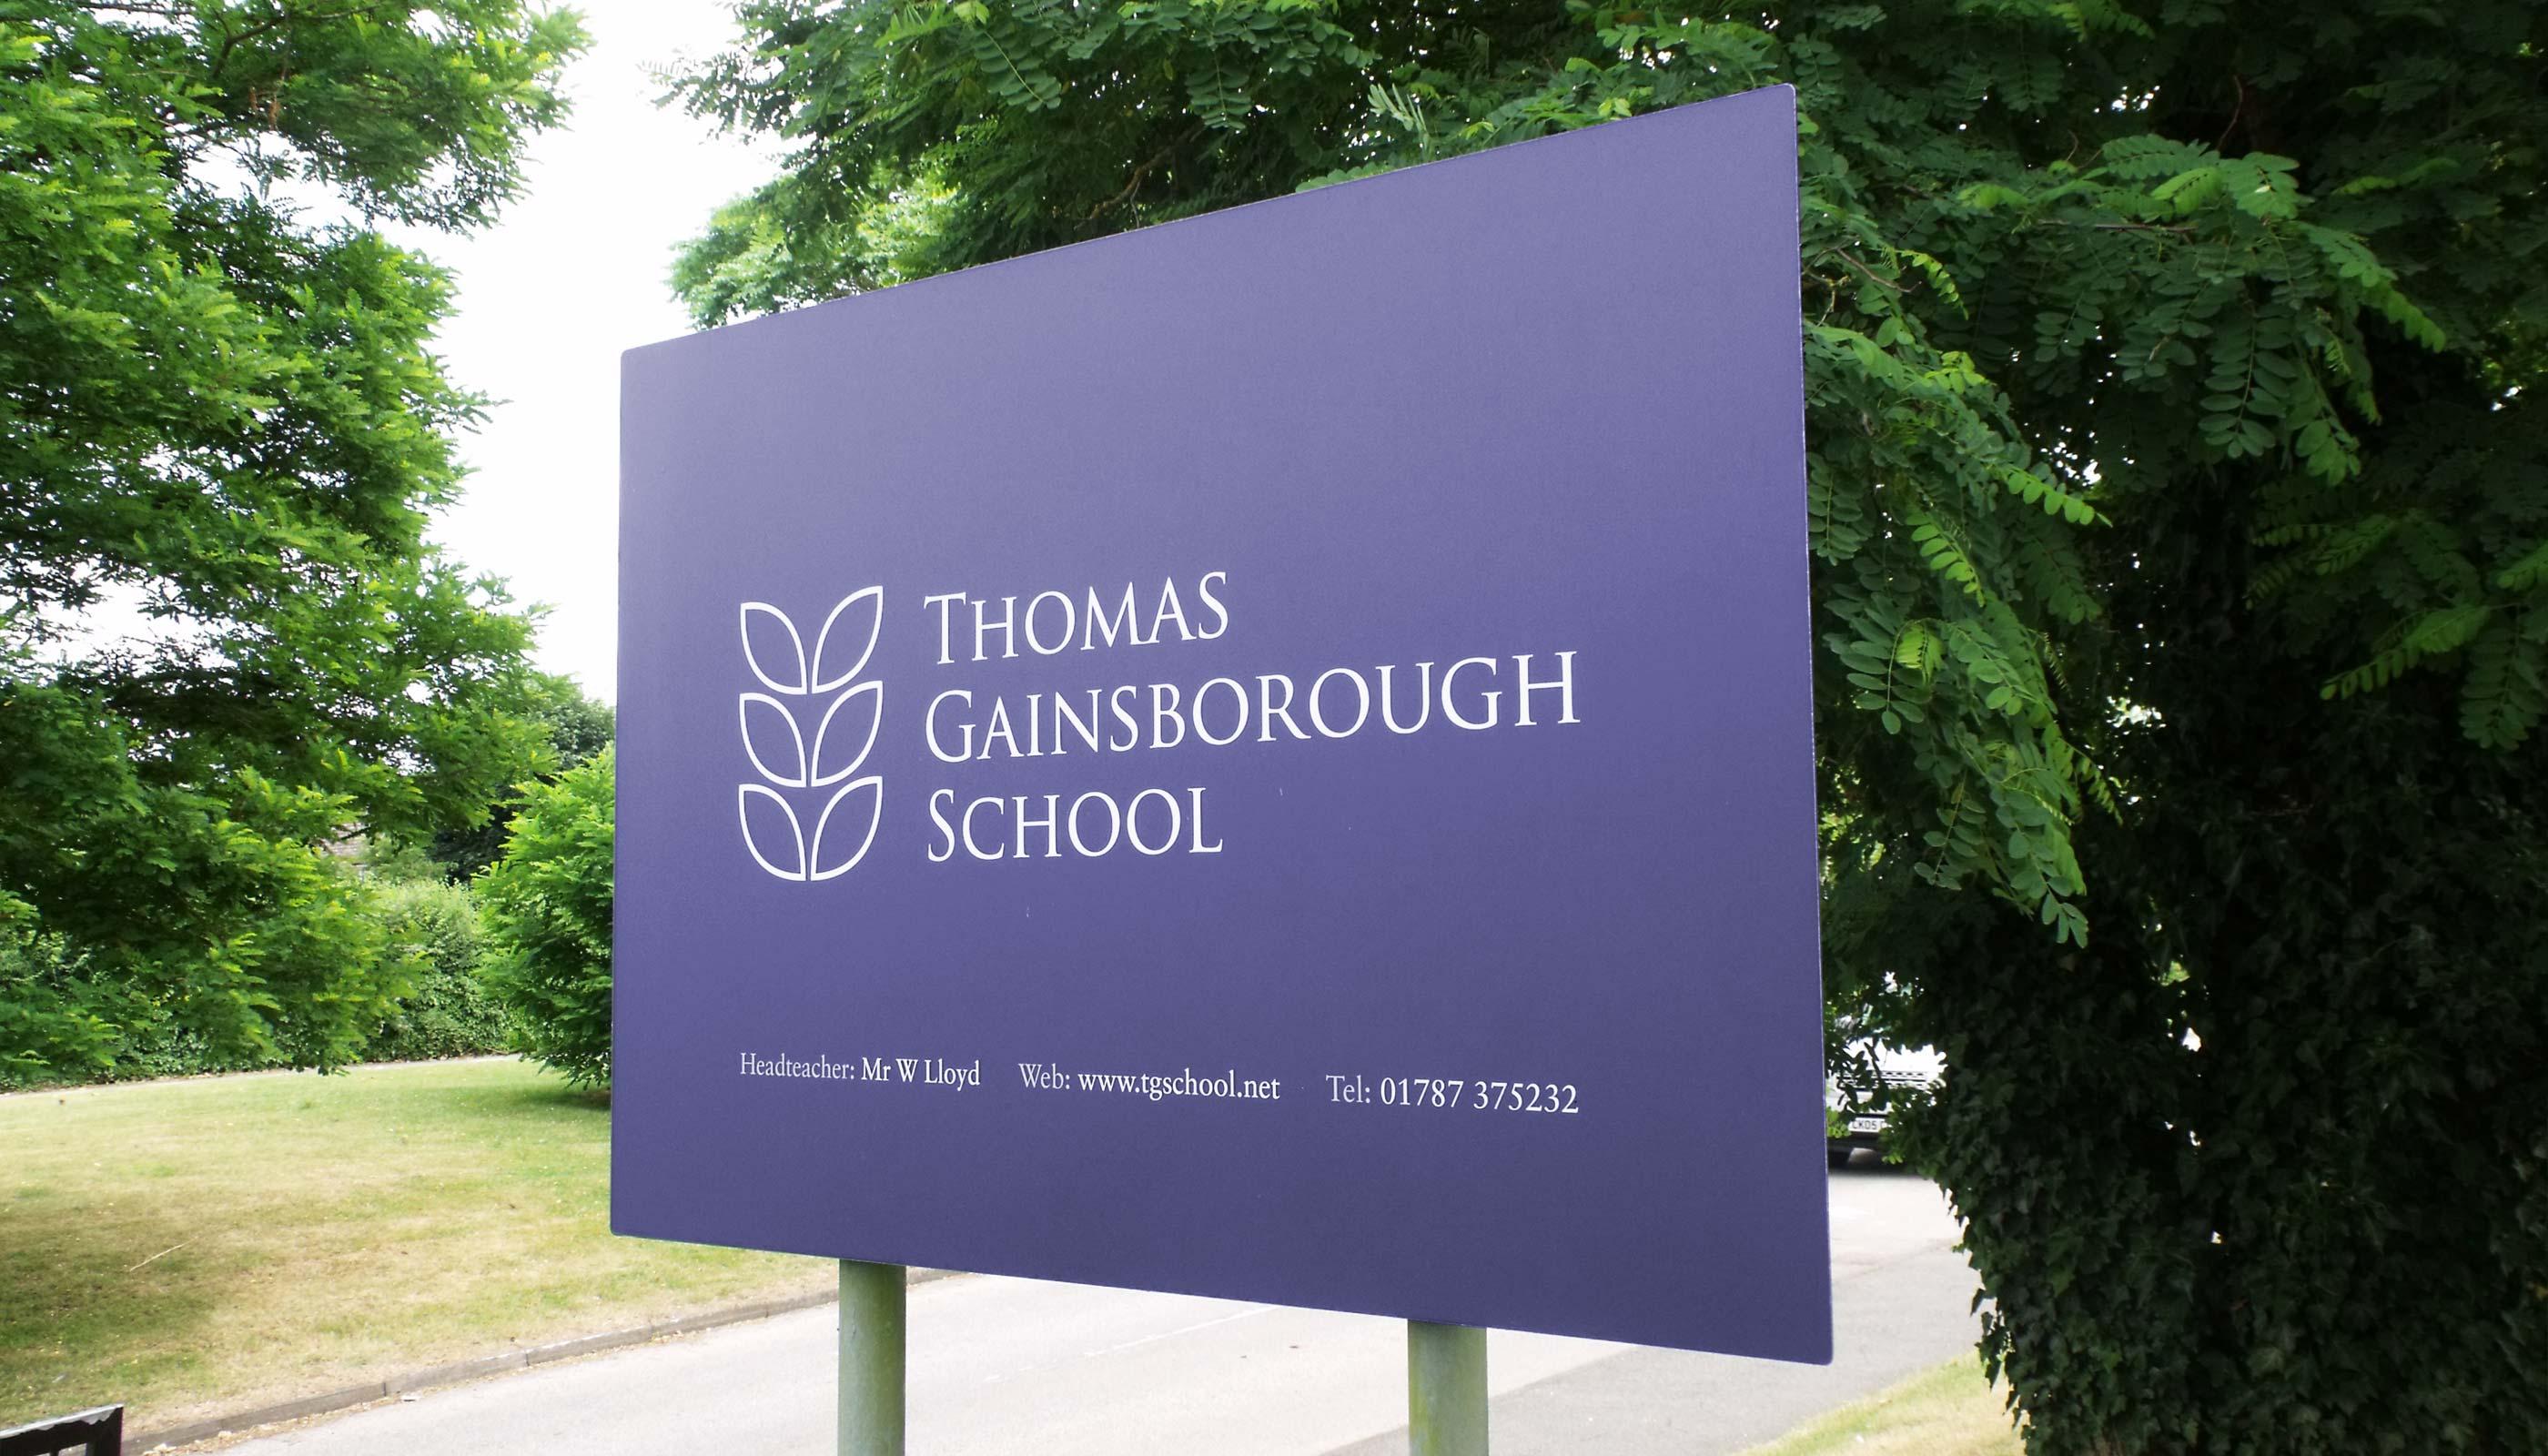 Signage design for Thomas Gainsborough School in Sudbury, Suffolk.